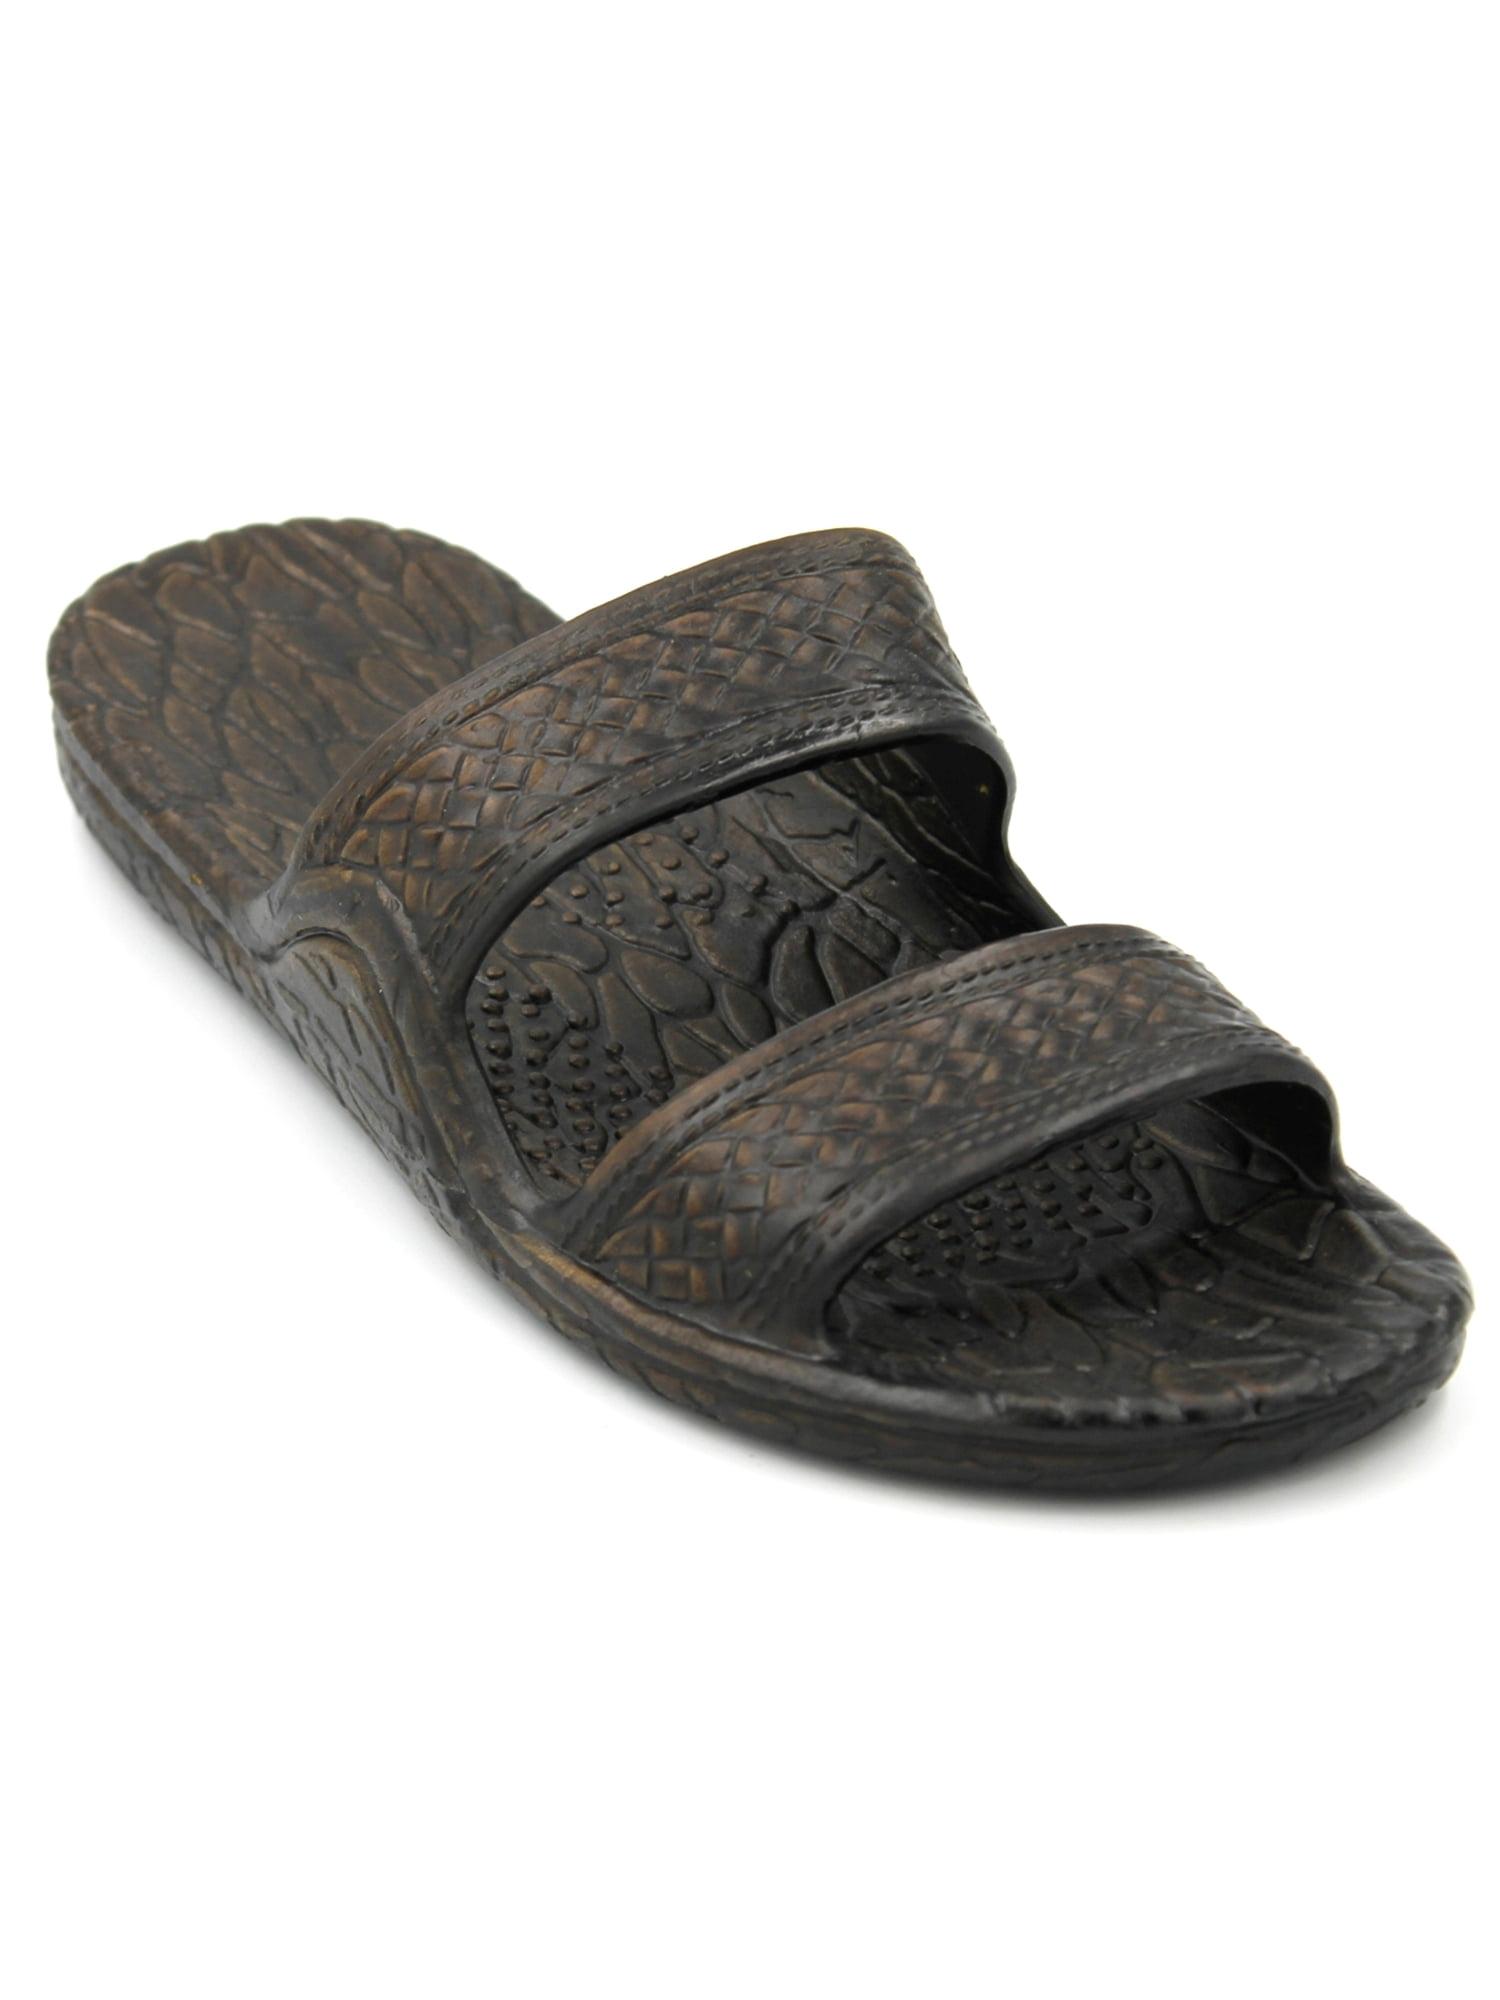 Genuine Original Jesus Jandal Sandal (Dark Brown;Size 12)